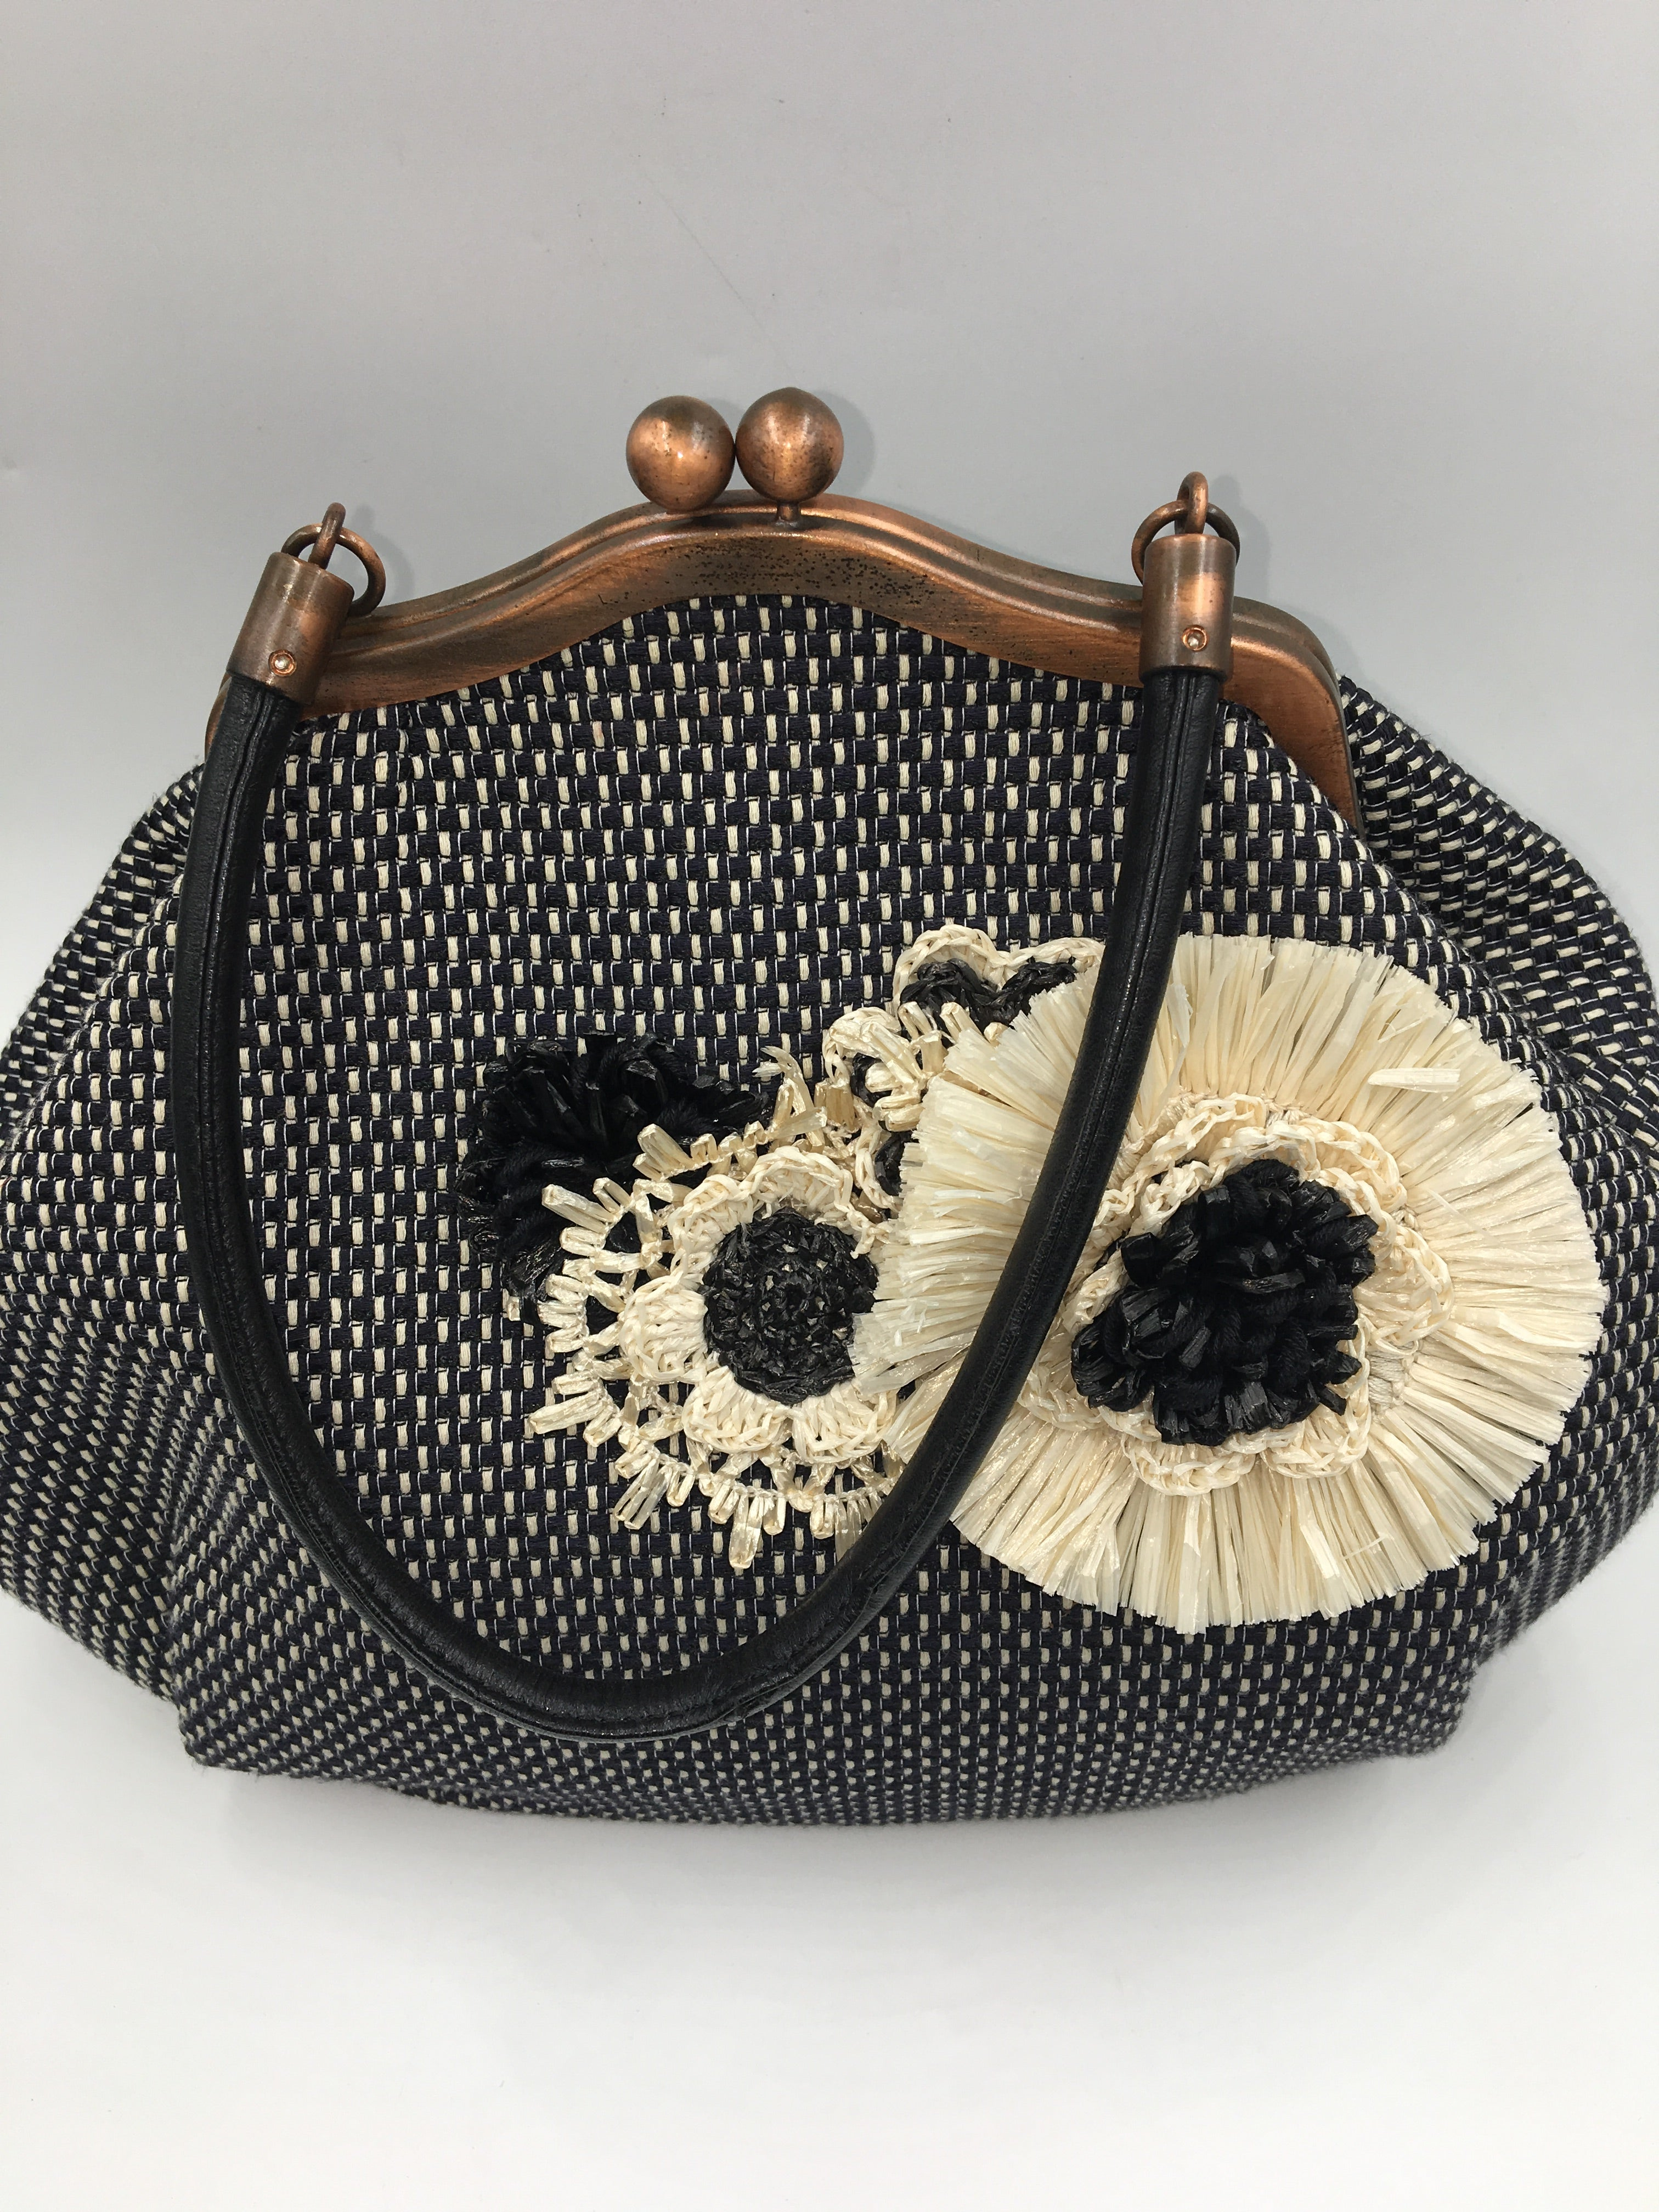 fb3a281973f ... Purse. Love Moschino Purses Luxe Handbags Farfetch. Moschino Handbag At  1stdibs